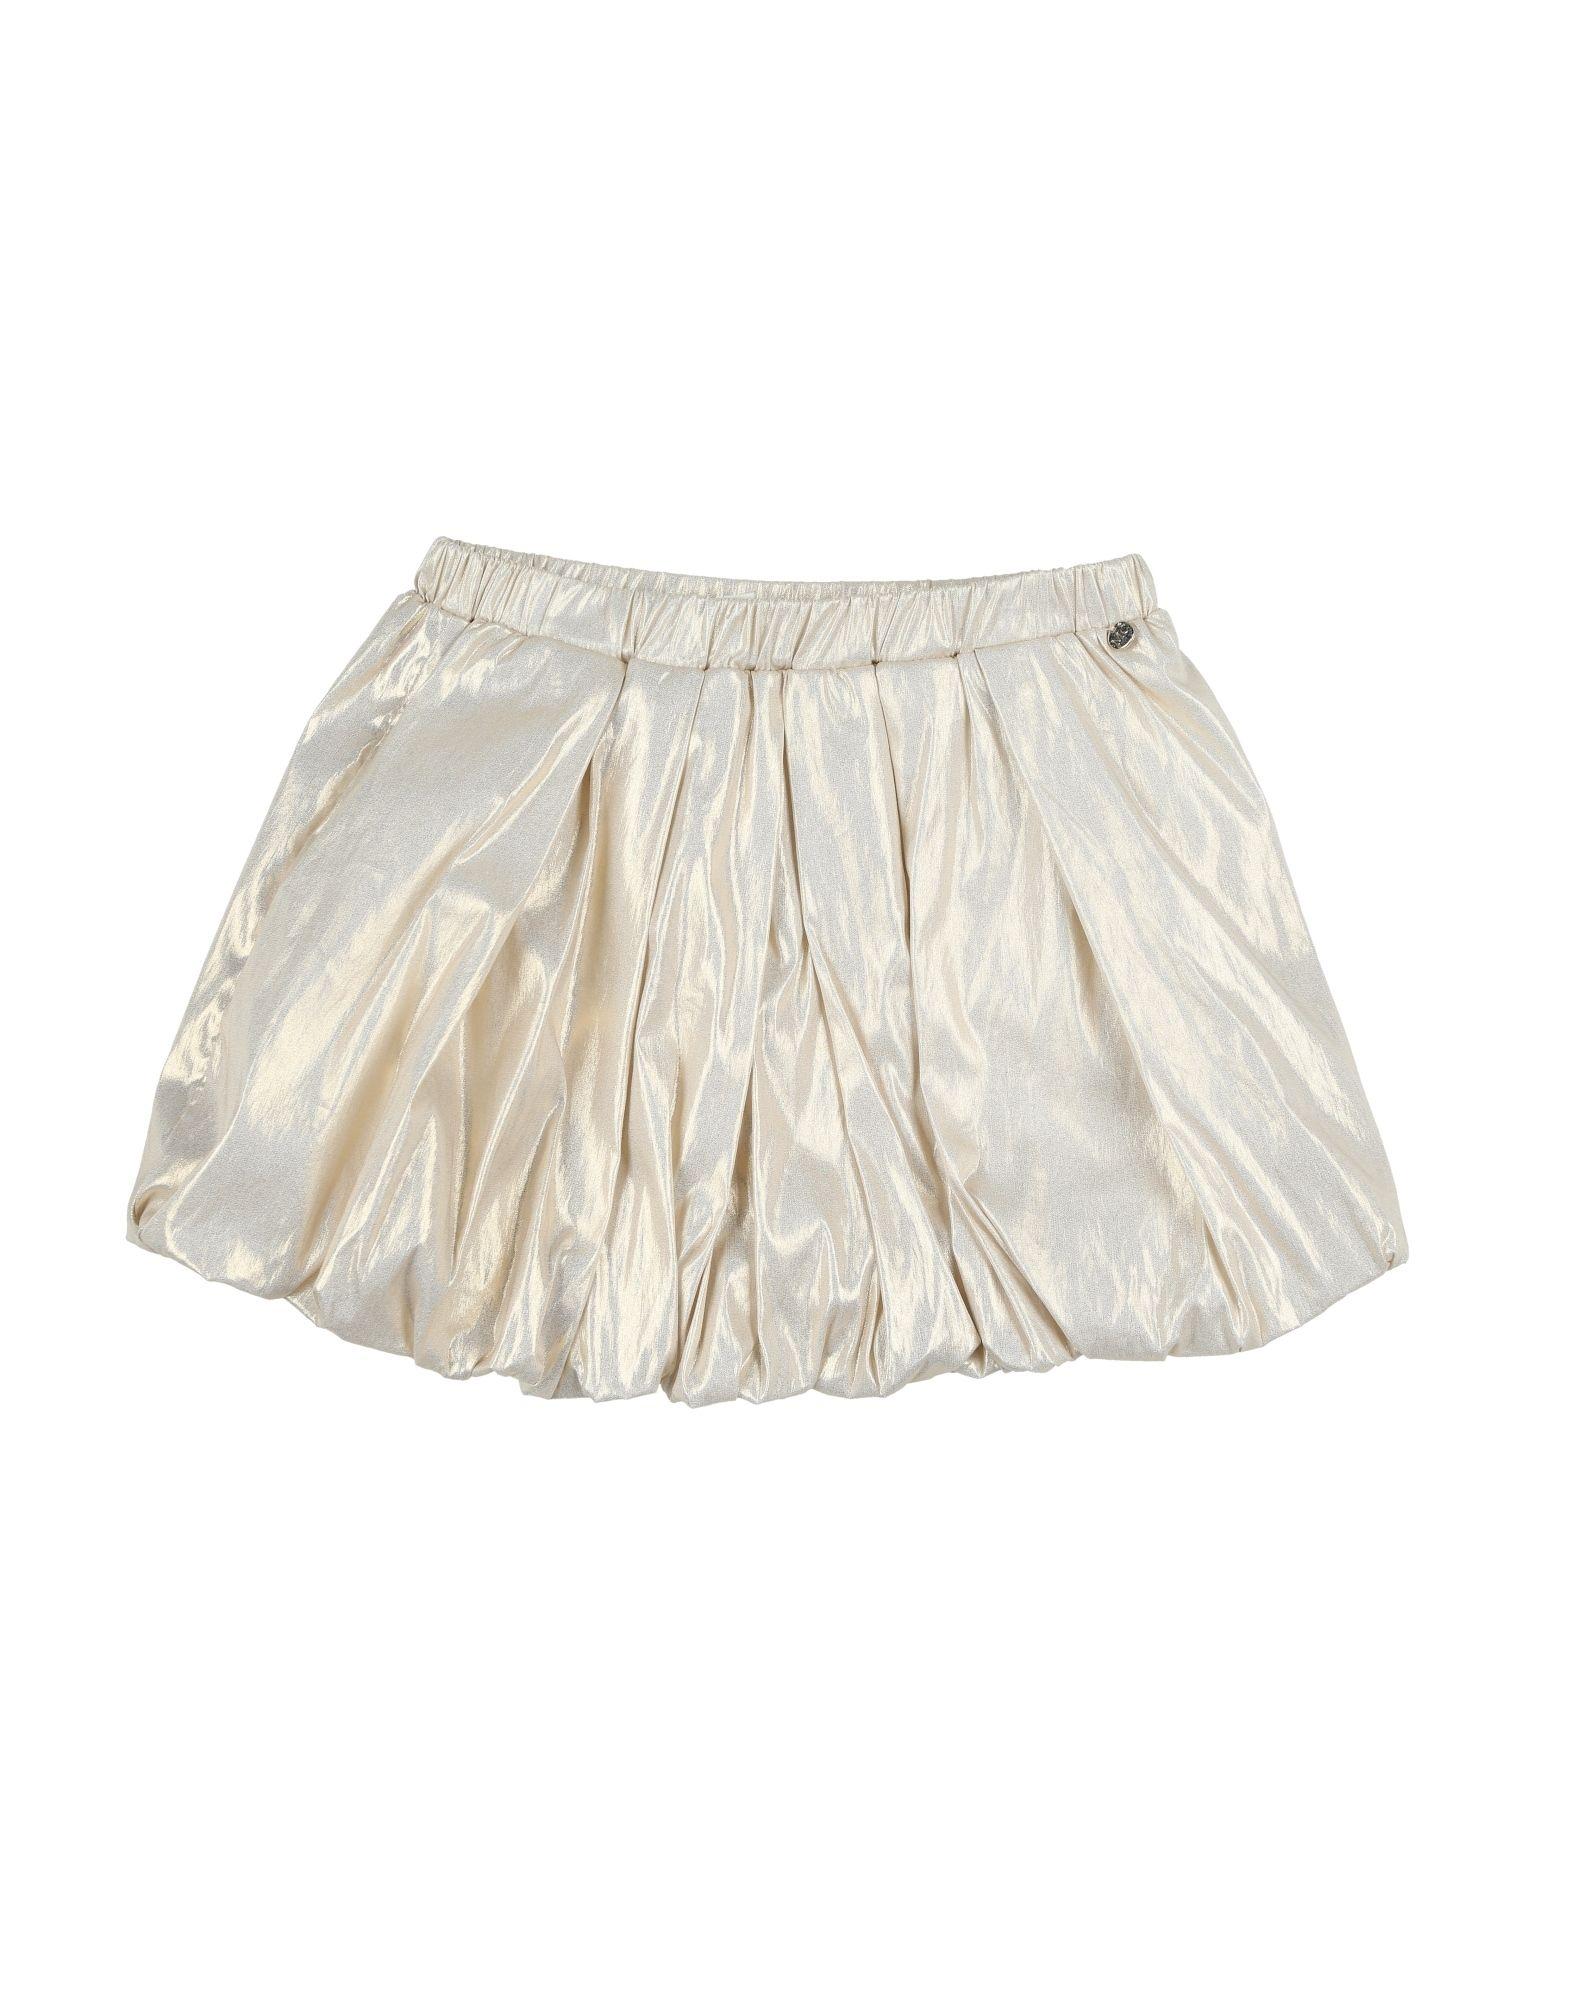 Фото - MICROBE by MISS GRANT Детская юбка microbe by miss grant джинсовая верхняя одежда